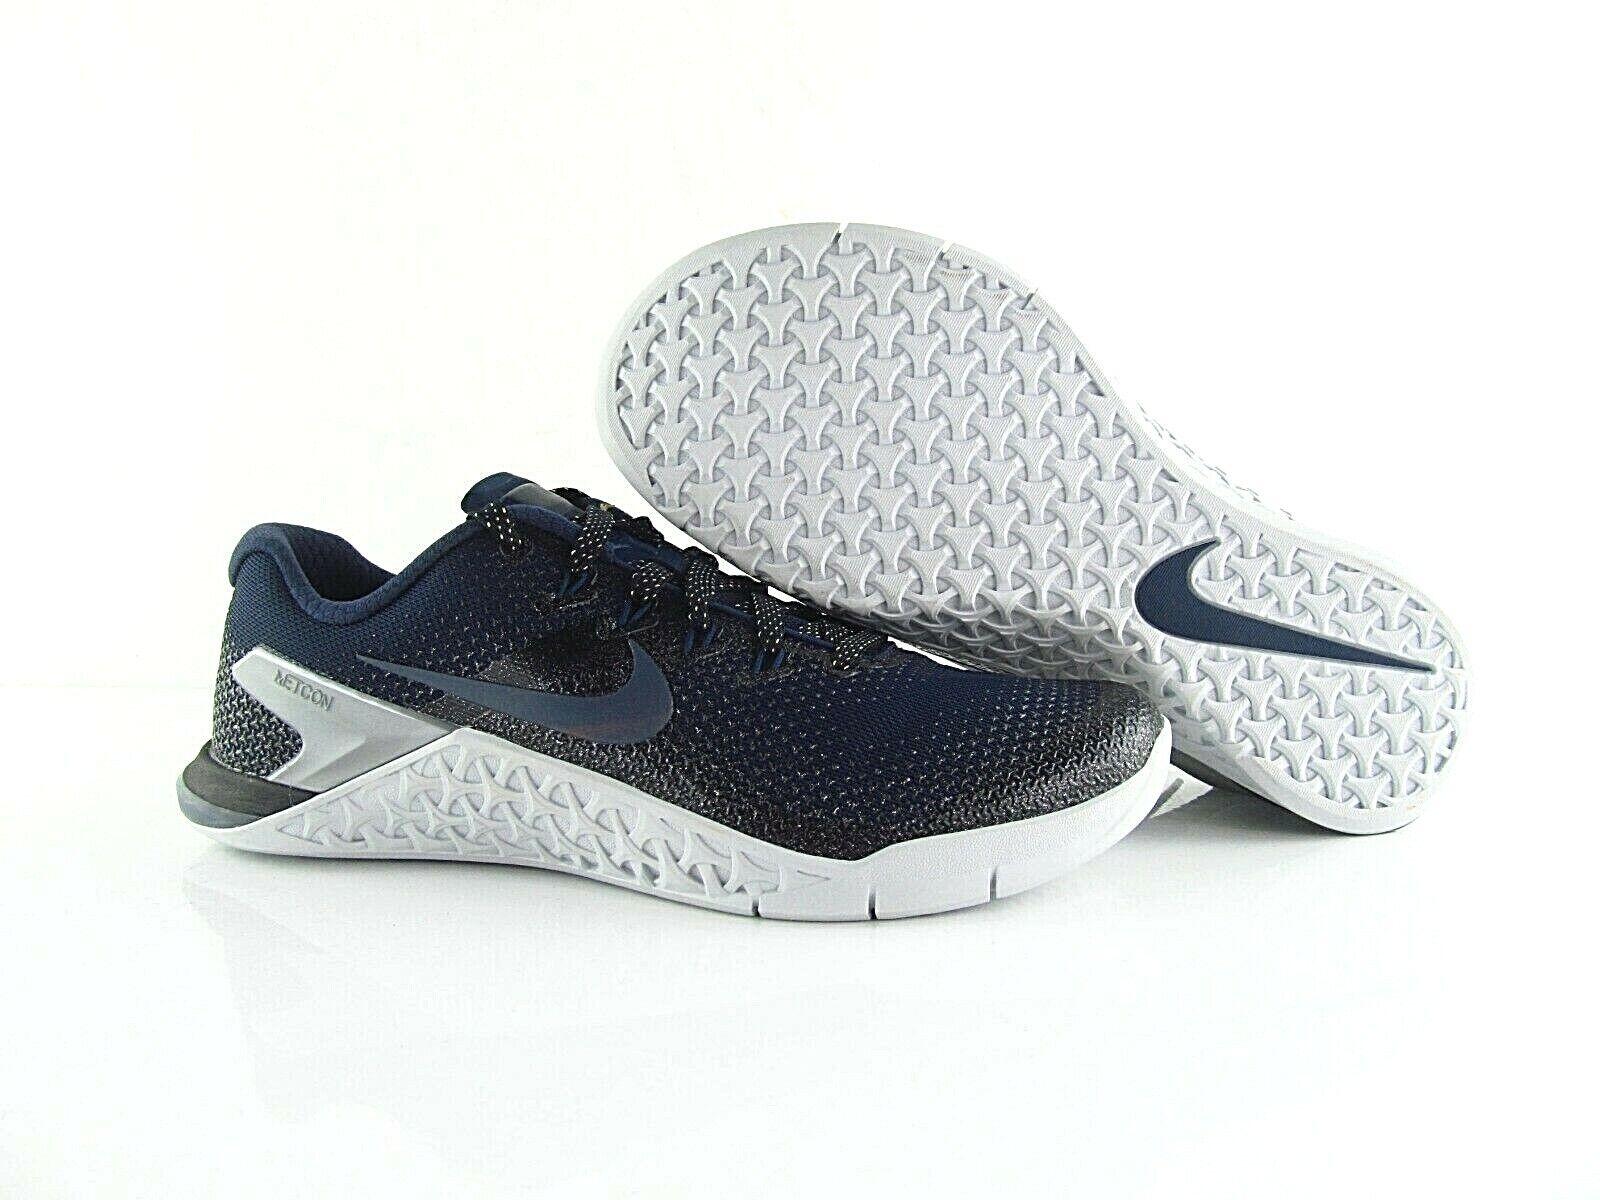 Nike Wmns Metcon 4 Metallic Crossfit AJ7804 440 Training US_9 Eur 40.5